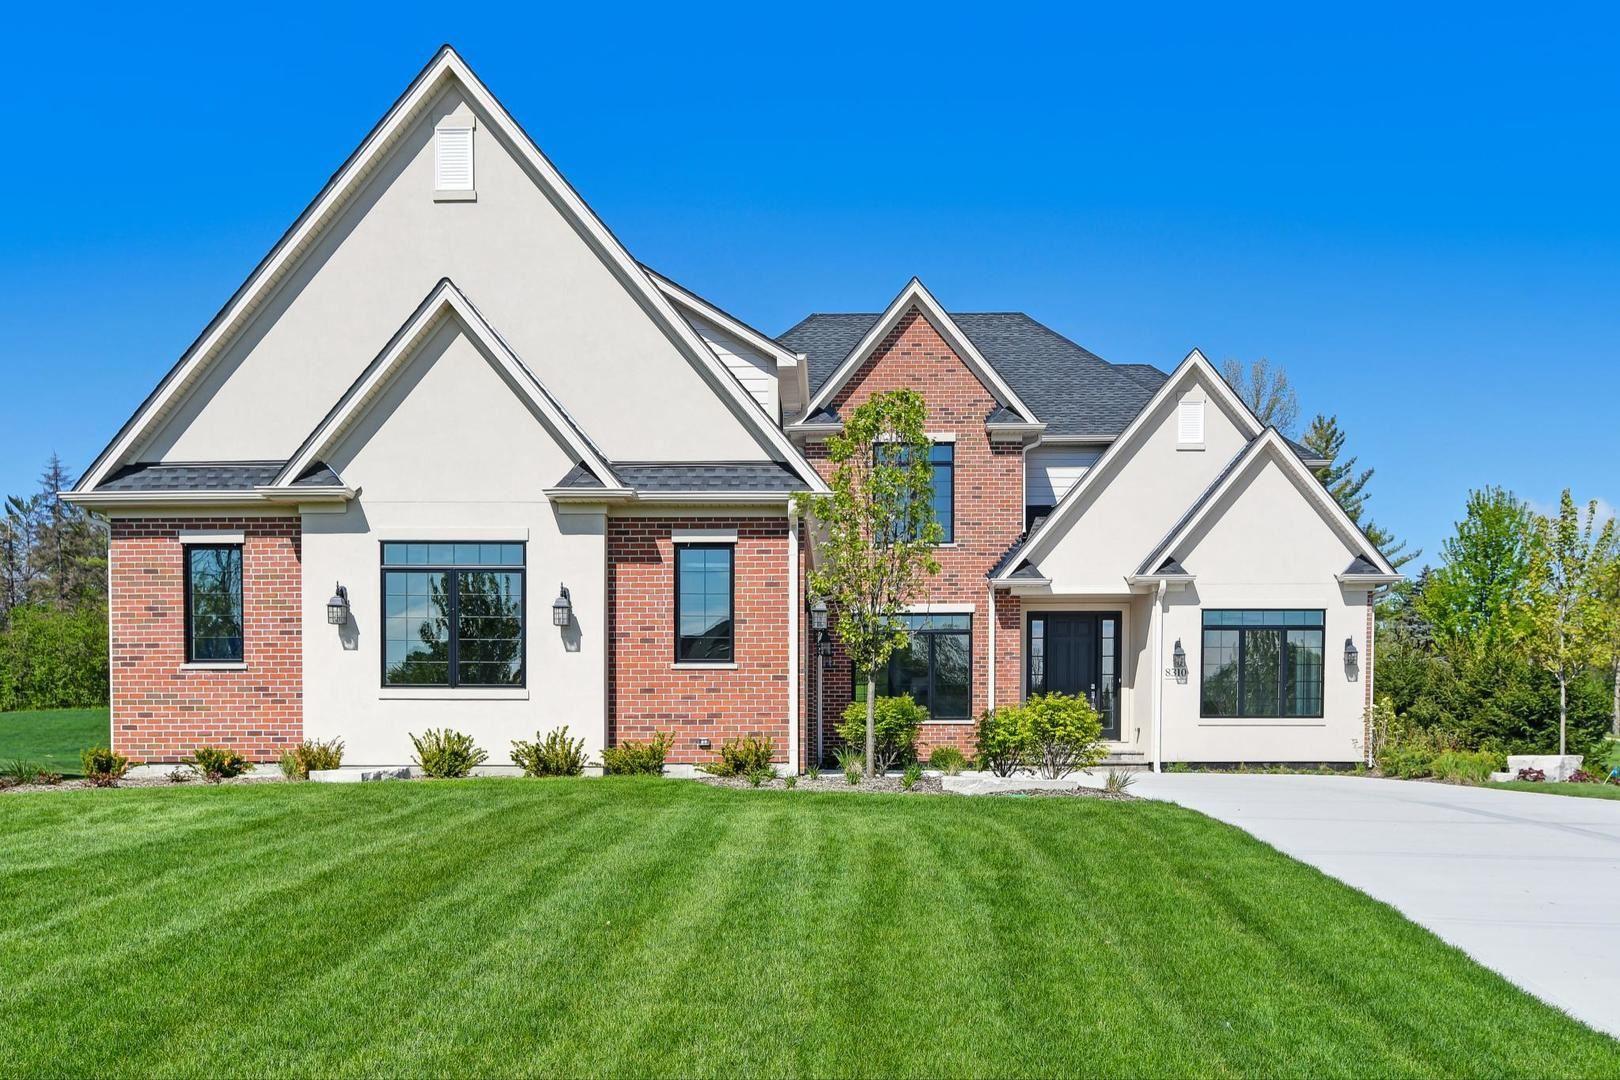 8310 Waterview Court, Burr Ridge, IL 60527 - #: 11220617